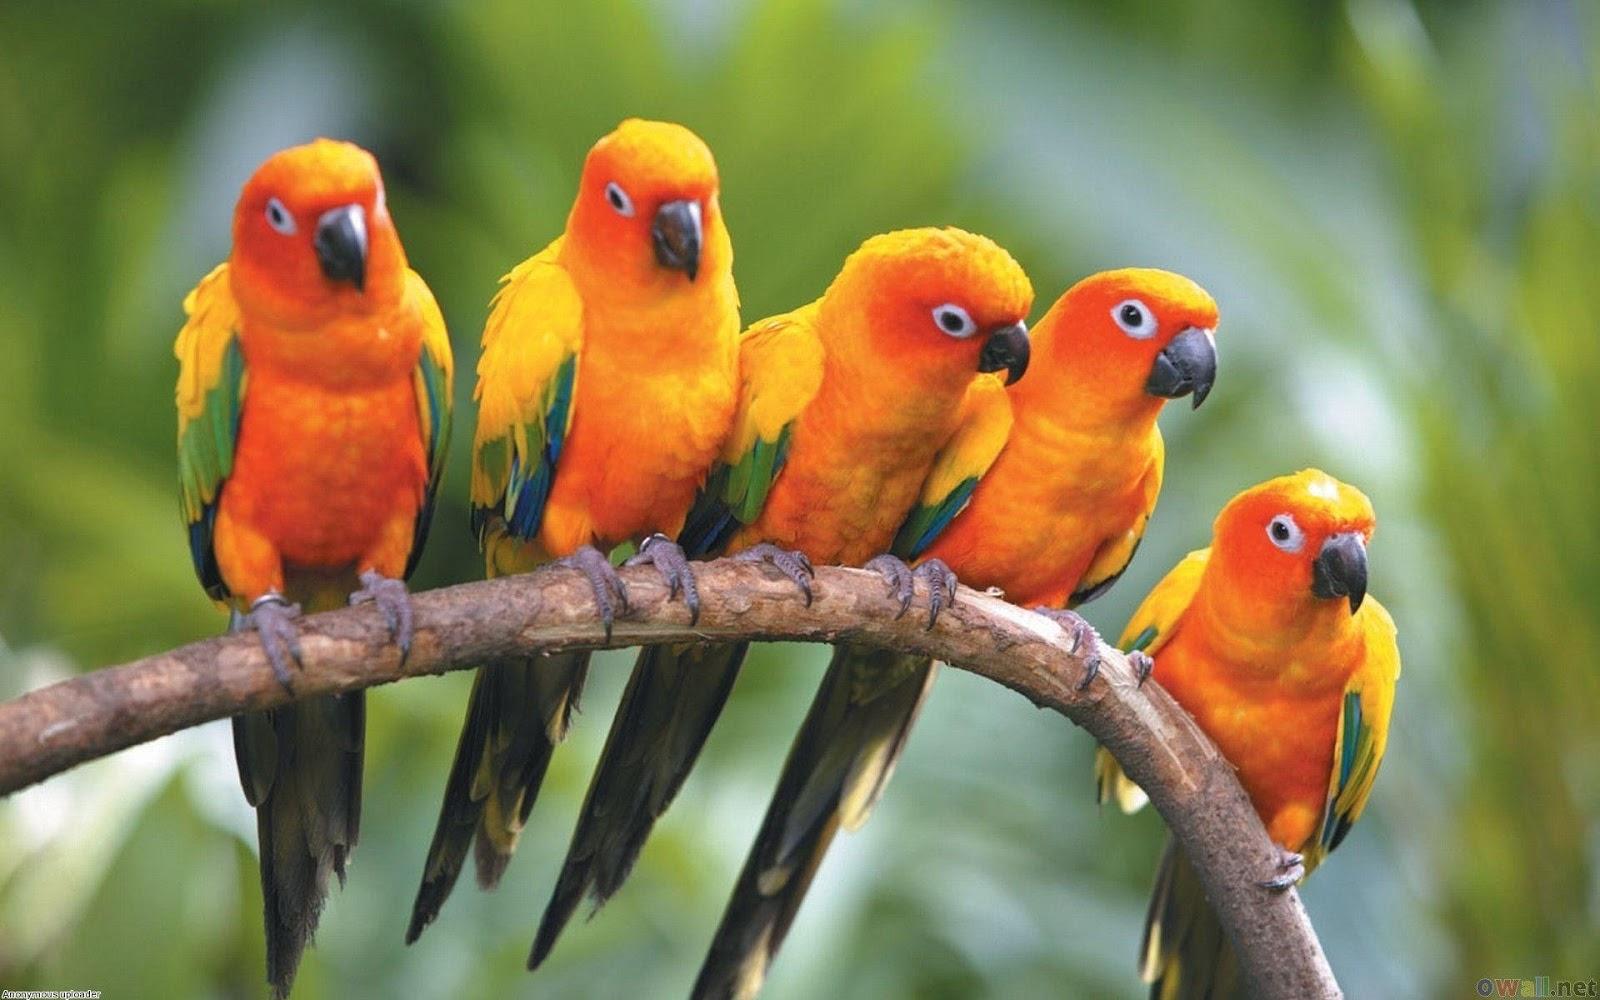 Hd Wallpapers birds wallpaper